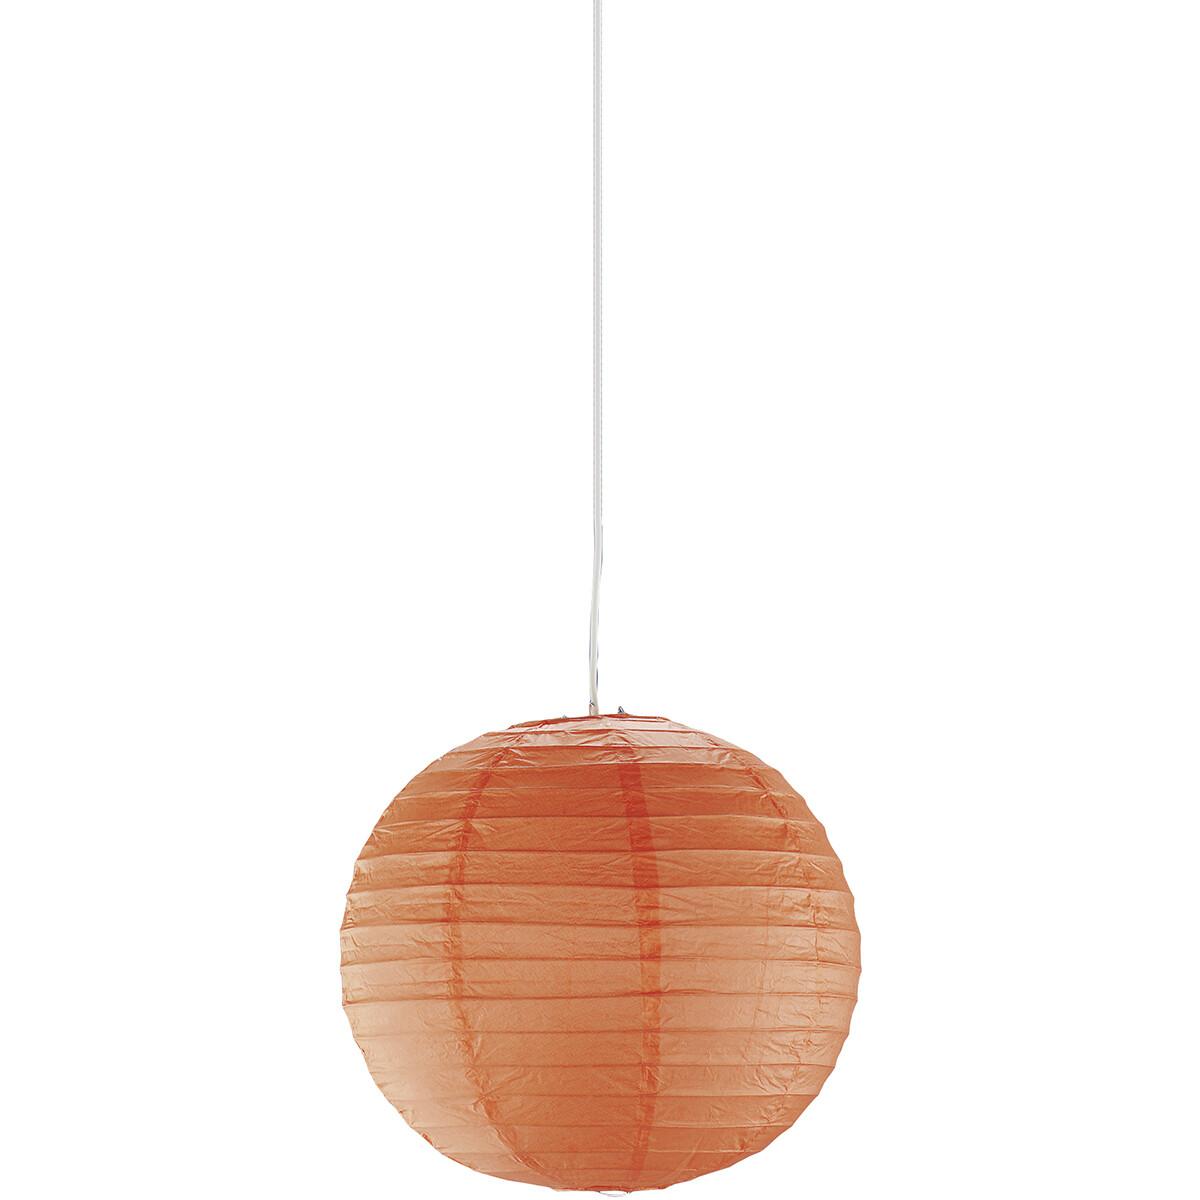 LED Hanglamp - Hangverlichting - Trion Ponton - Rond - Mat Oranje - Papier